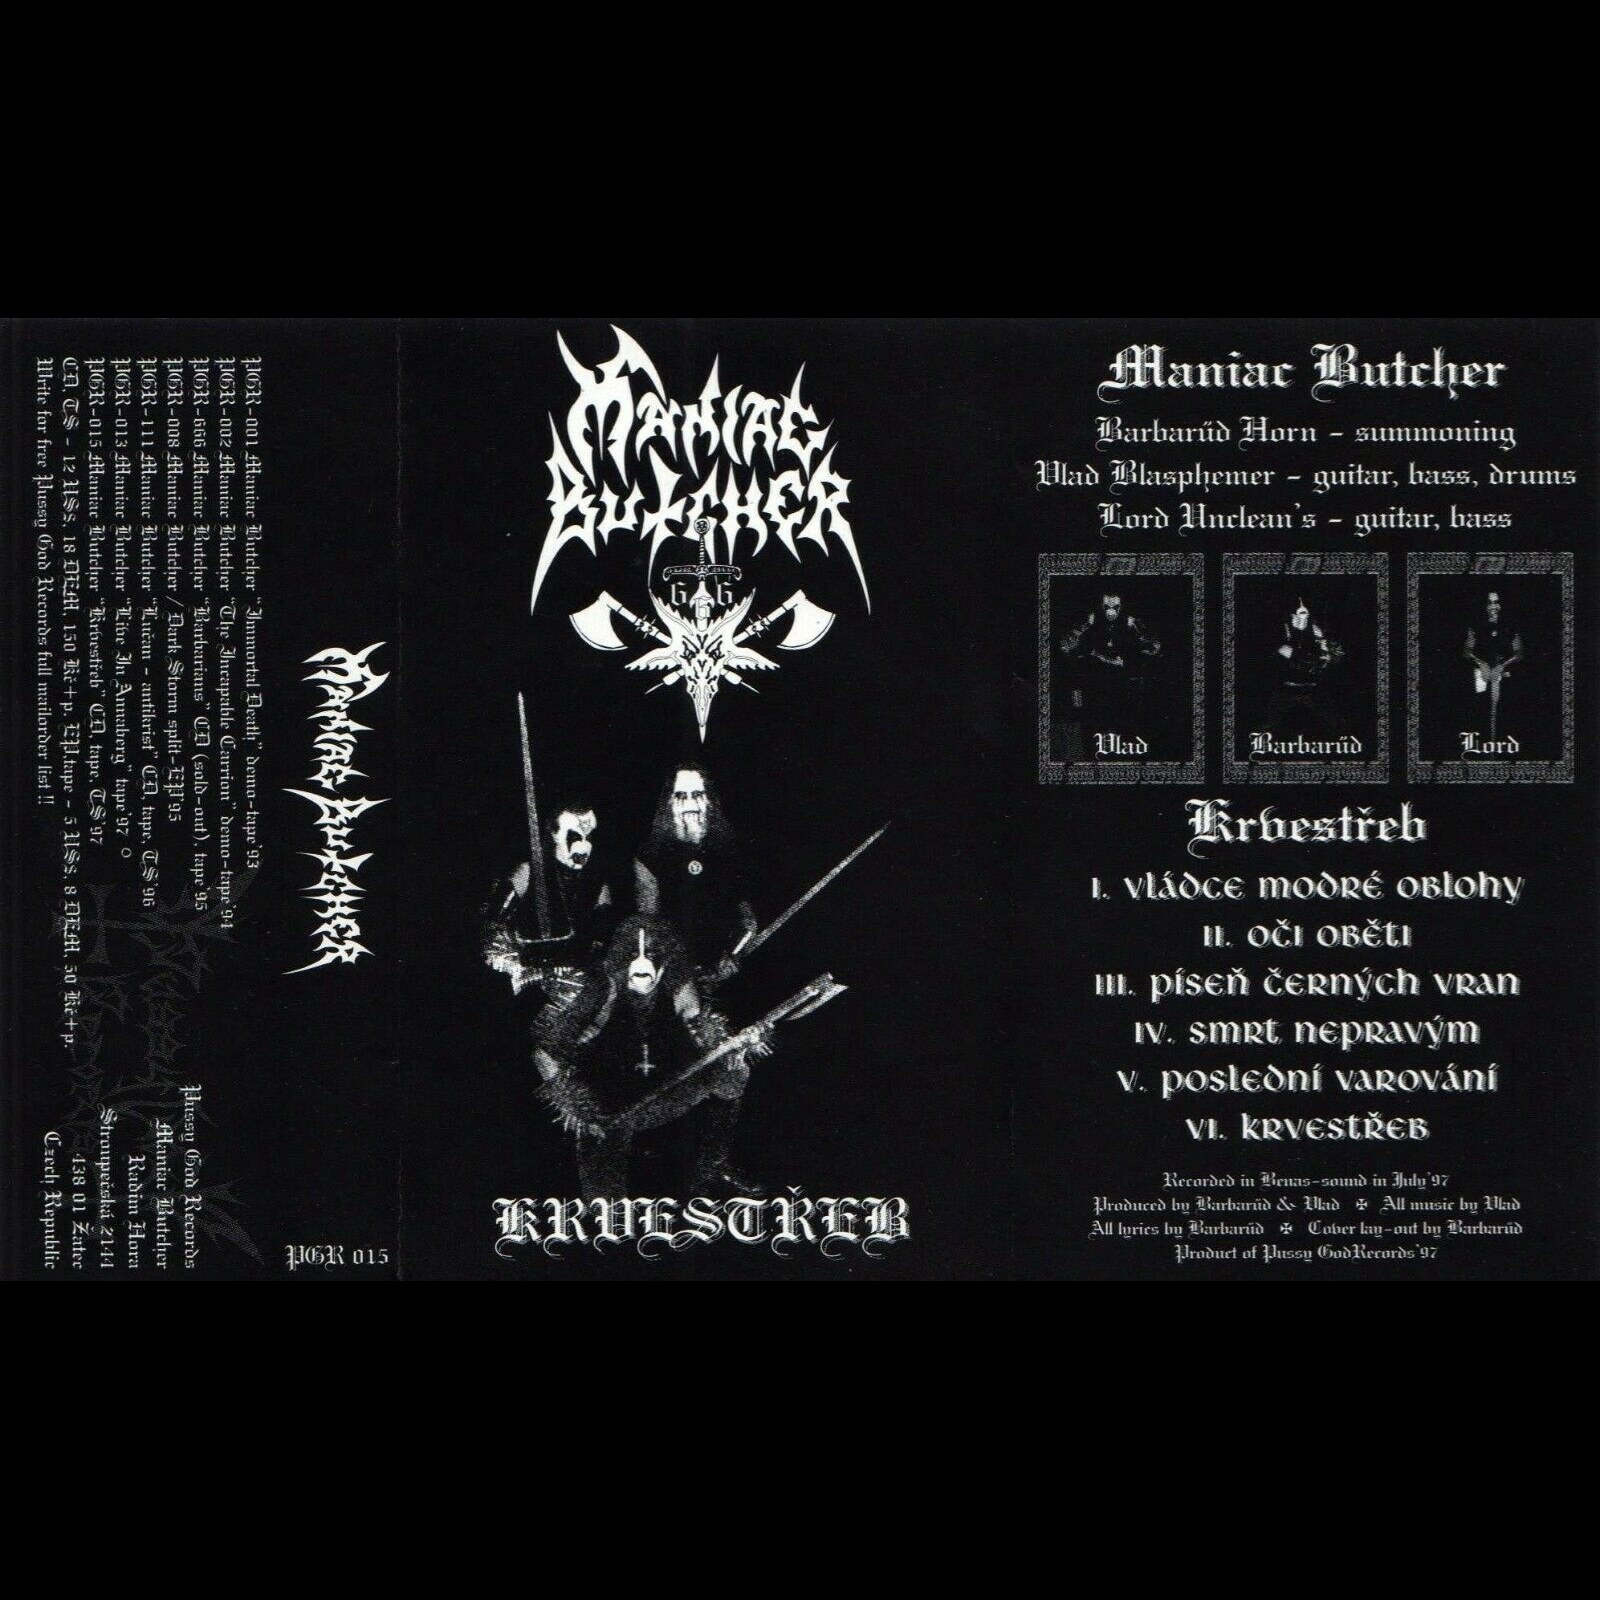 Reviews for Maniac Butcher - Krvestřeb